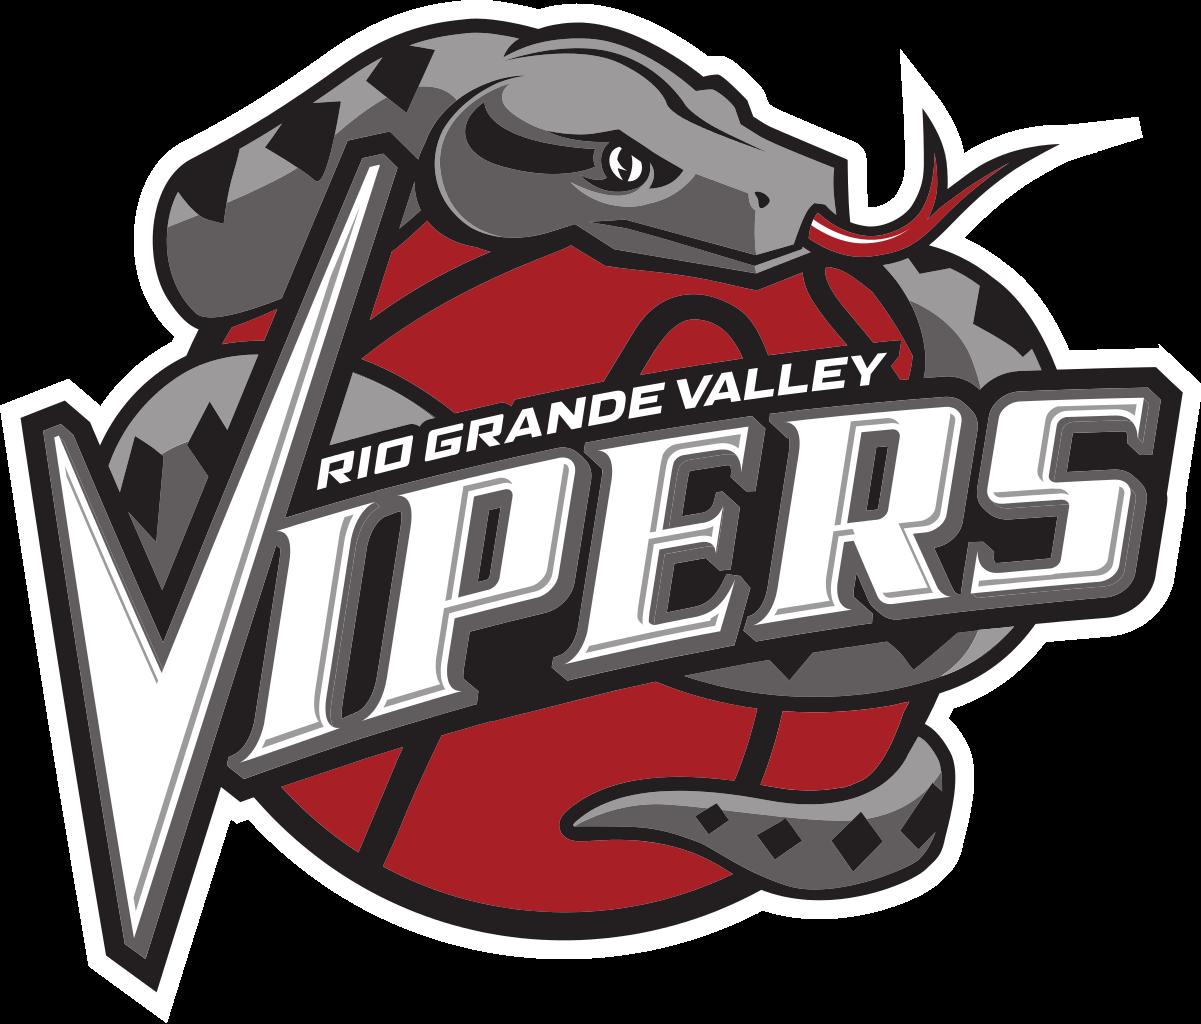 Rio Grande Valley Vipers, NBA Development League, Hidalgo